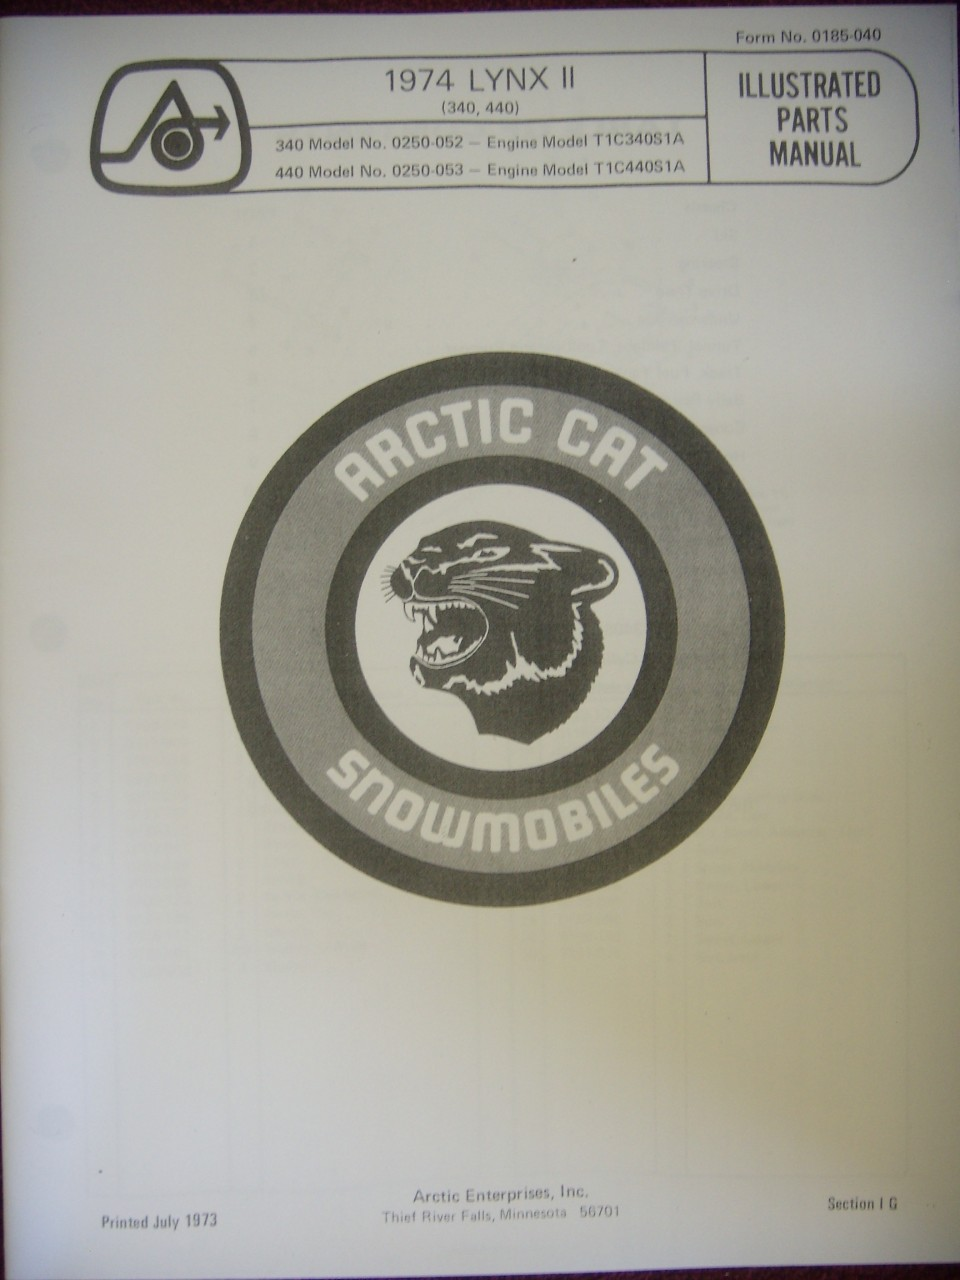 2008 pontiac grand prix repair manual 81216 array ll manual rh ll manual fullerspullers us fandeluxe Gallery